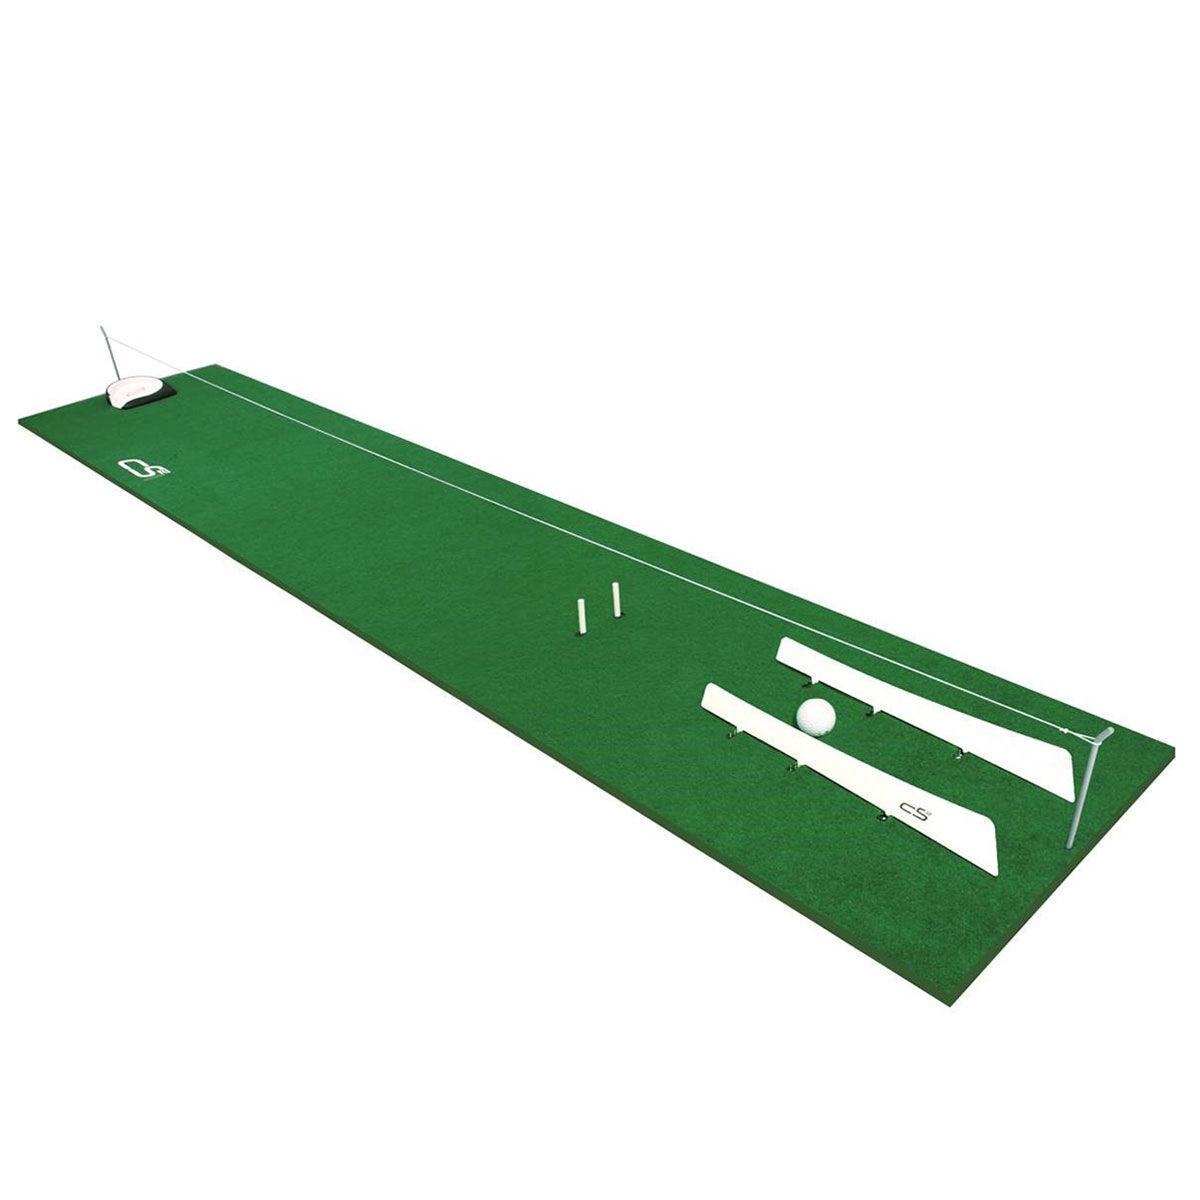 CS2 Putting Mat, Male, Green, 240x46x1cm   American Golf